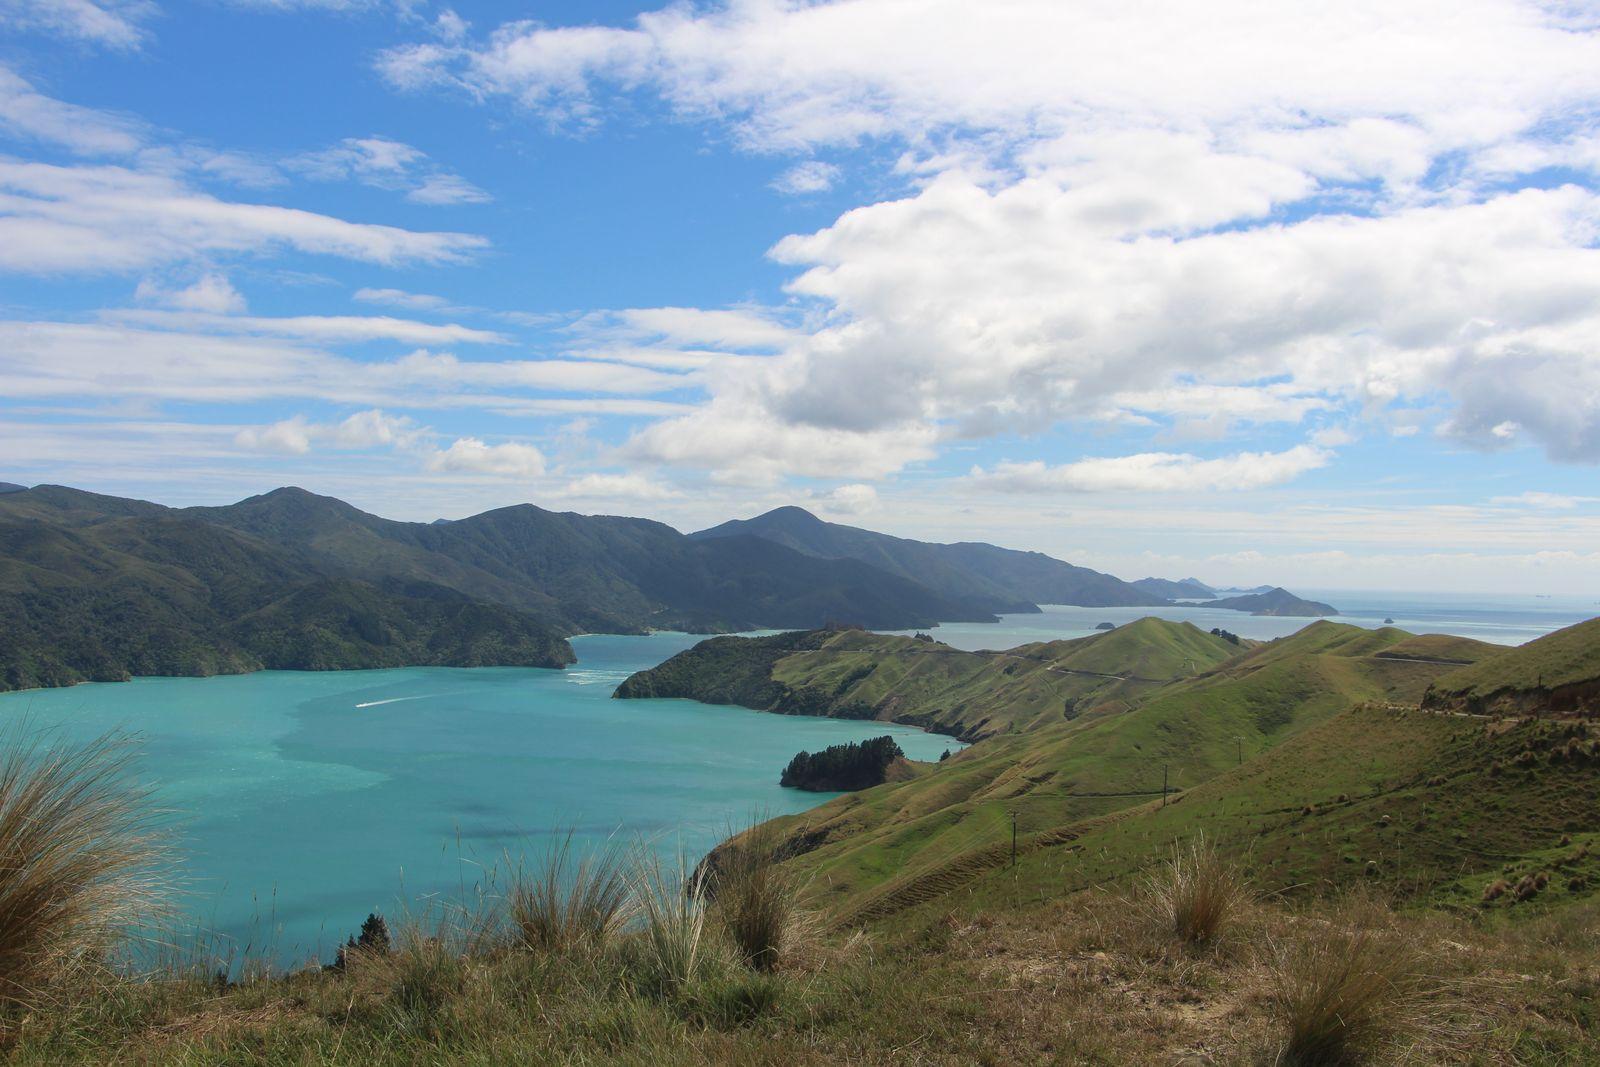 EINMALIGE VERWENDUNG Neuseeland Fewo / Claus Hecking